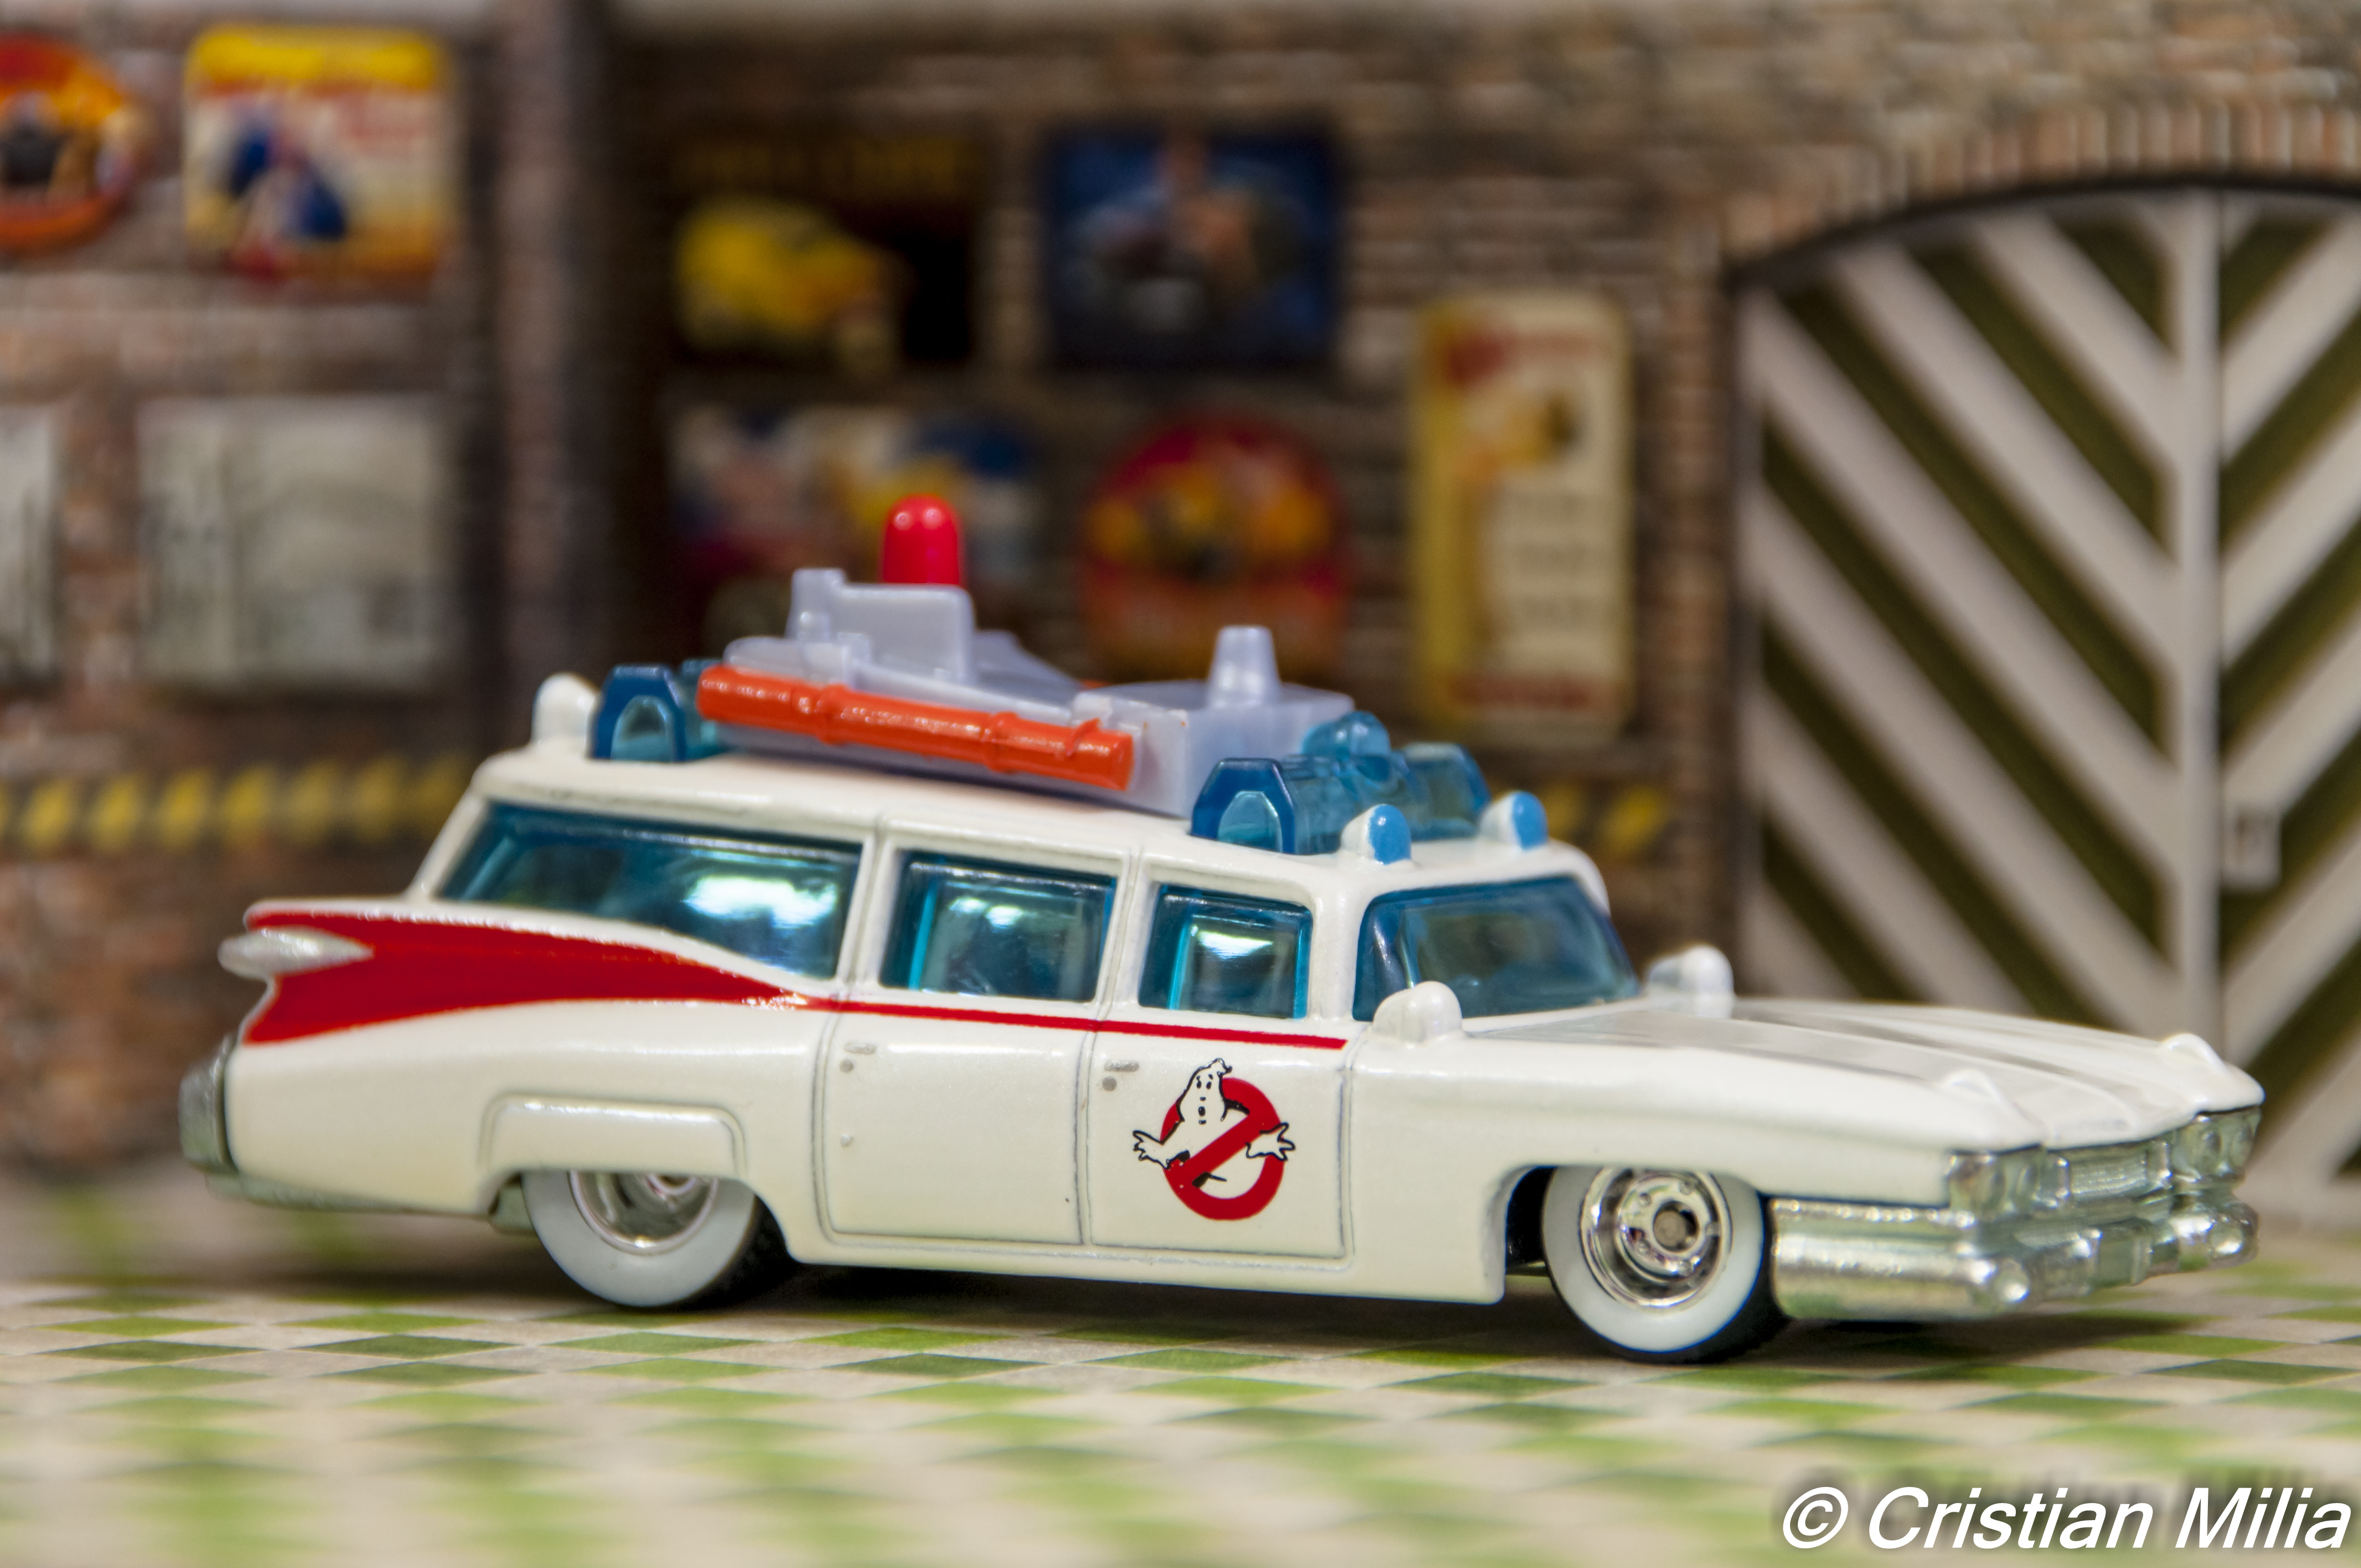 Ecto-1 Ghostbusters Cartoon Car